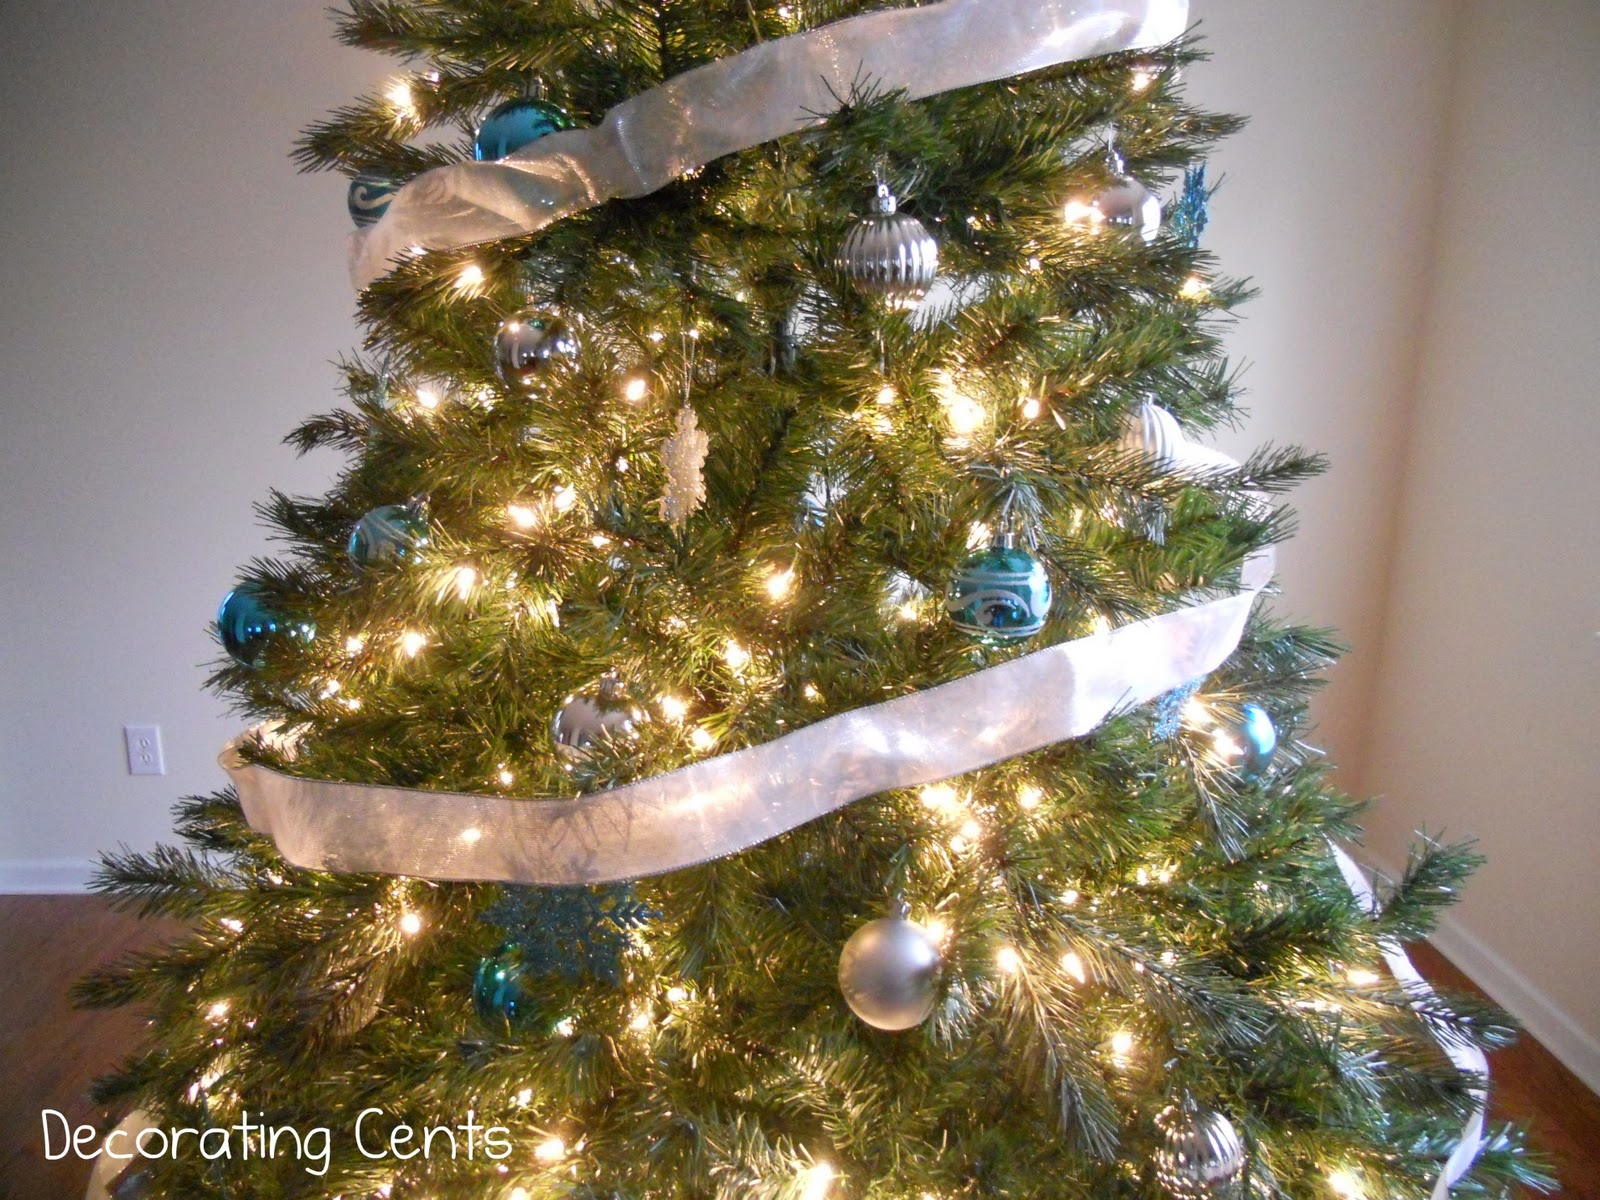 Garden Ridge Christmas Trees 2020 Decorations Dmptxb Mynewyearplus Site